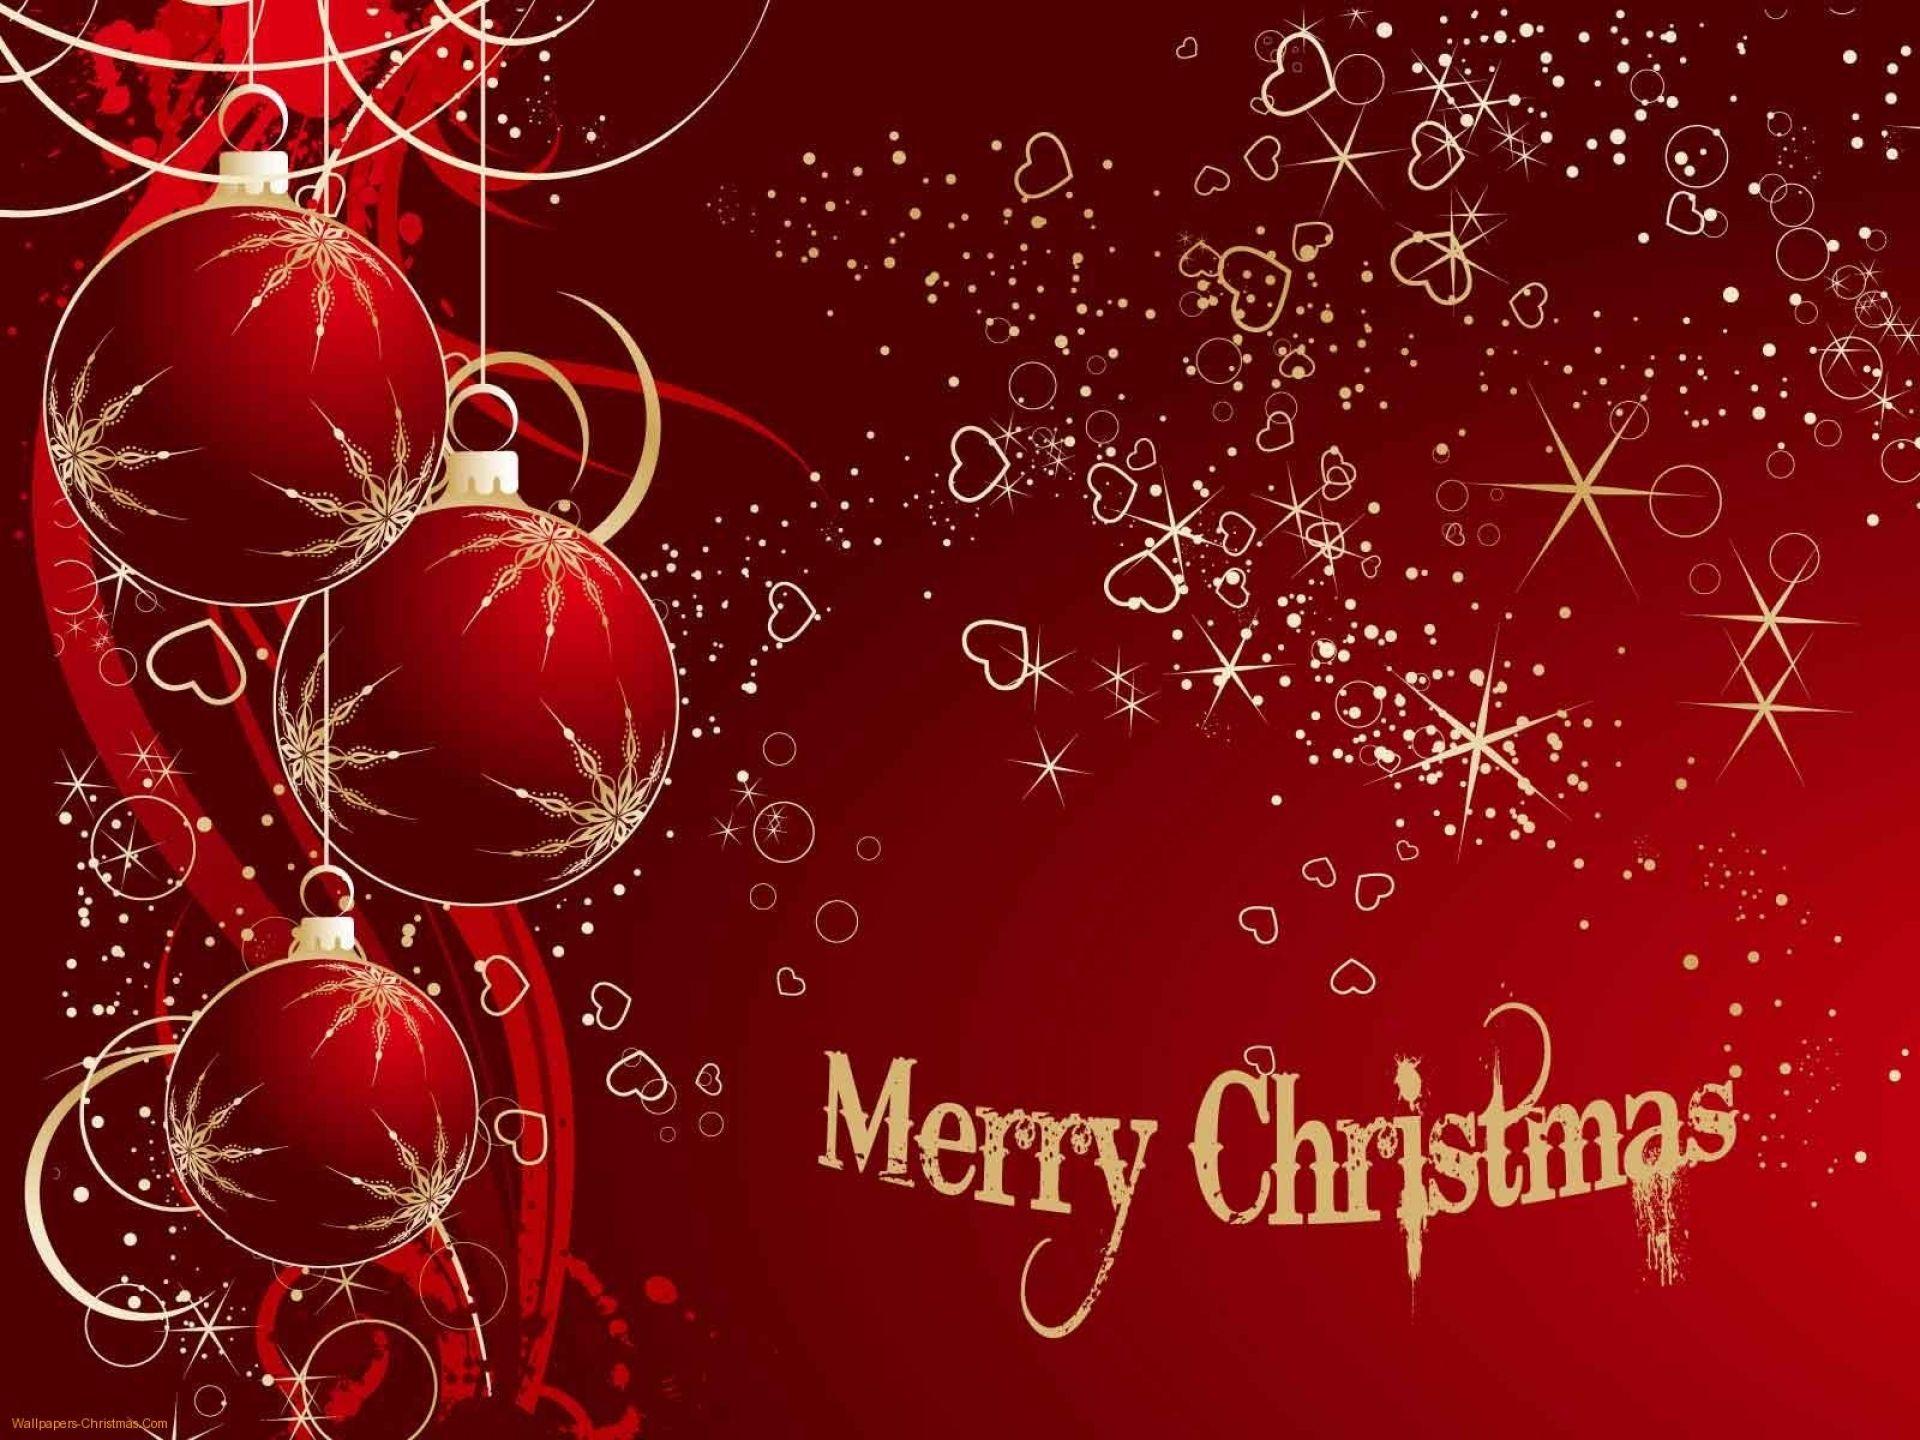 Download Merry Christmas Wallpaper Contoh cat, Abstrak